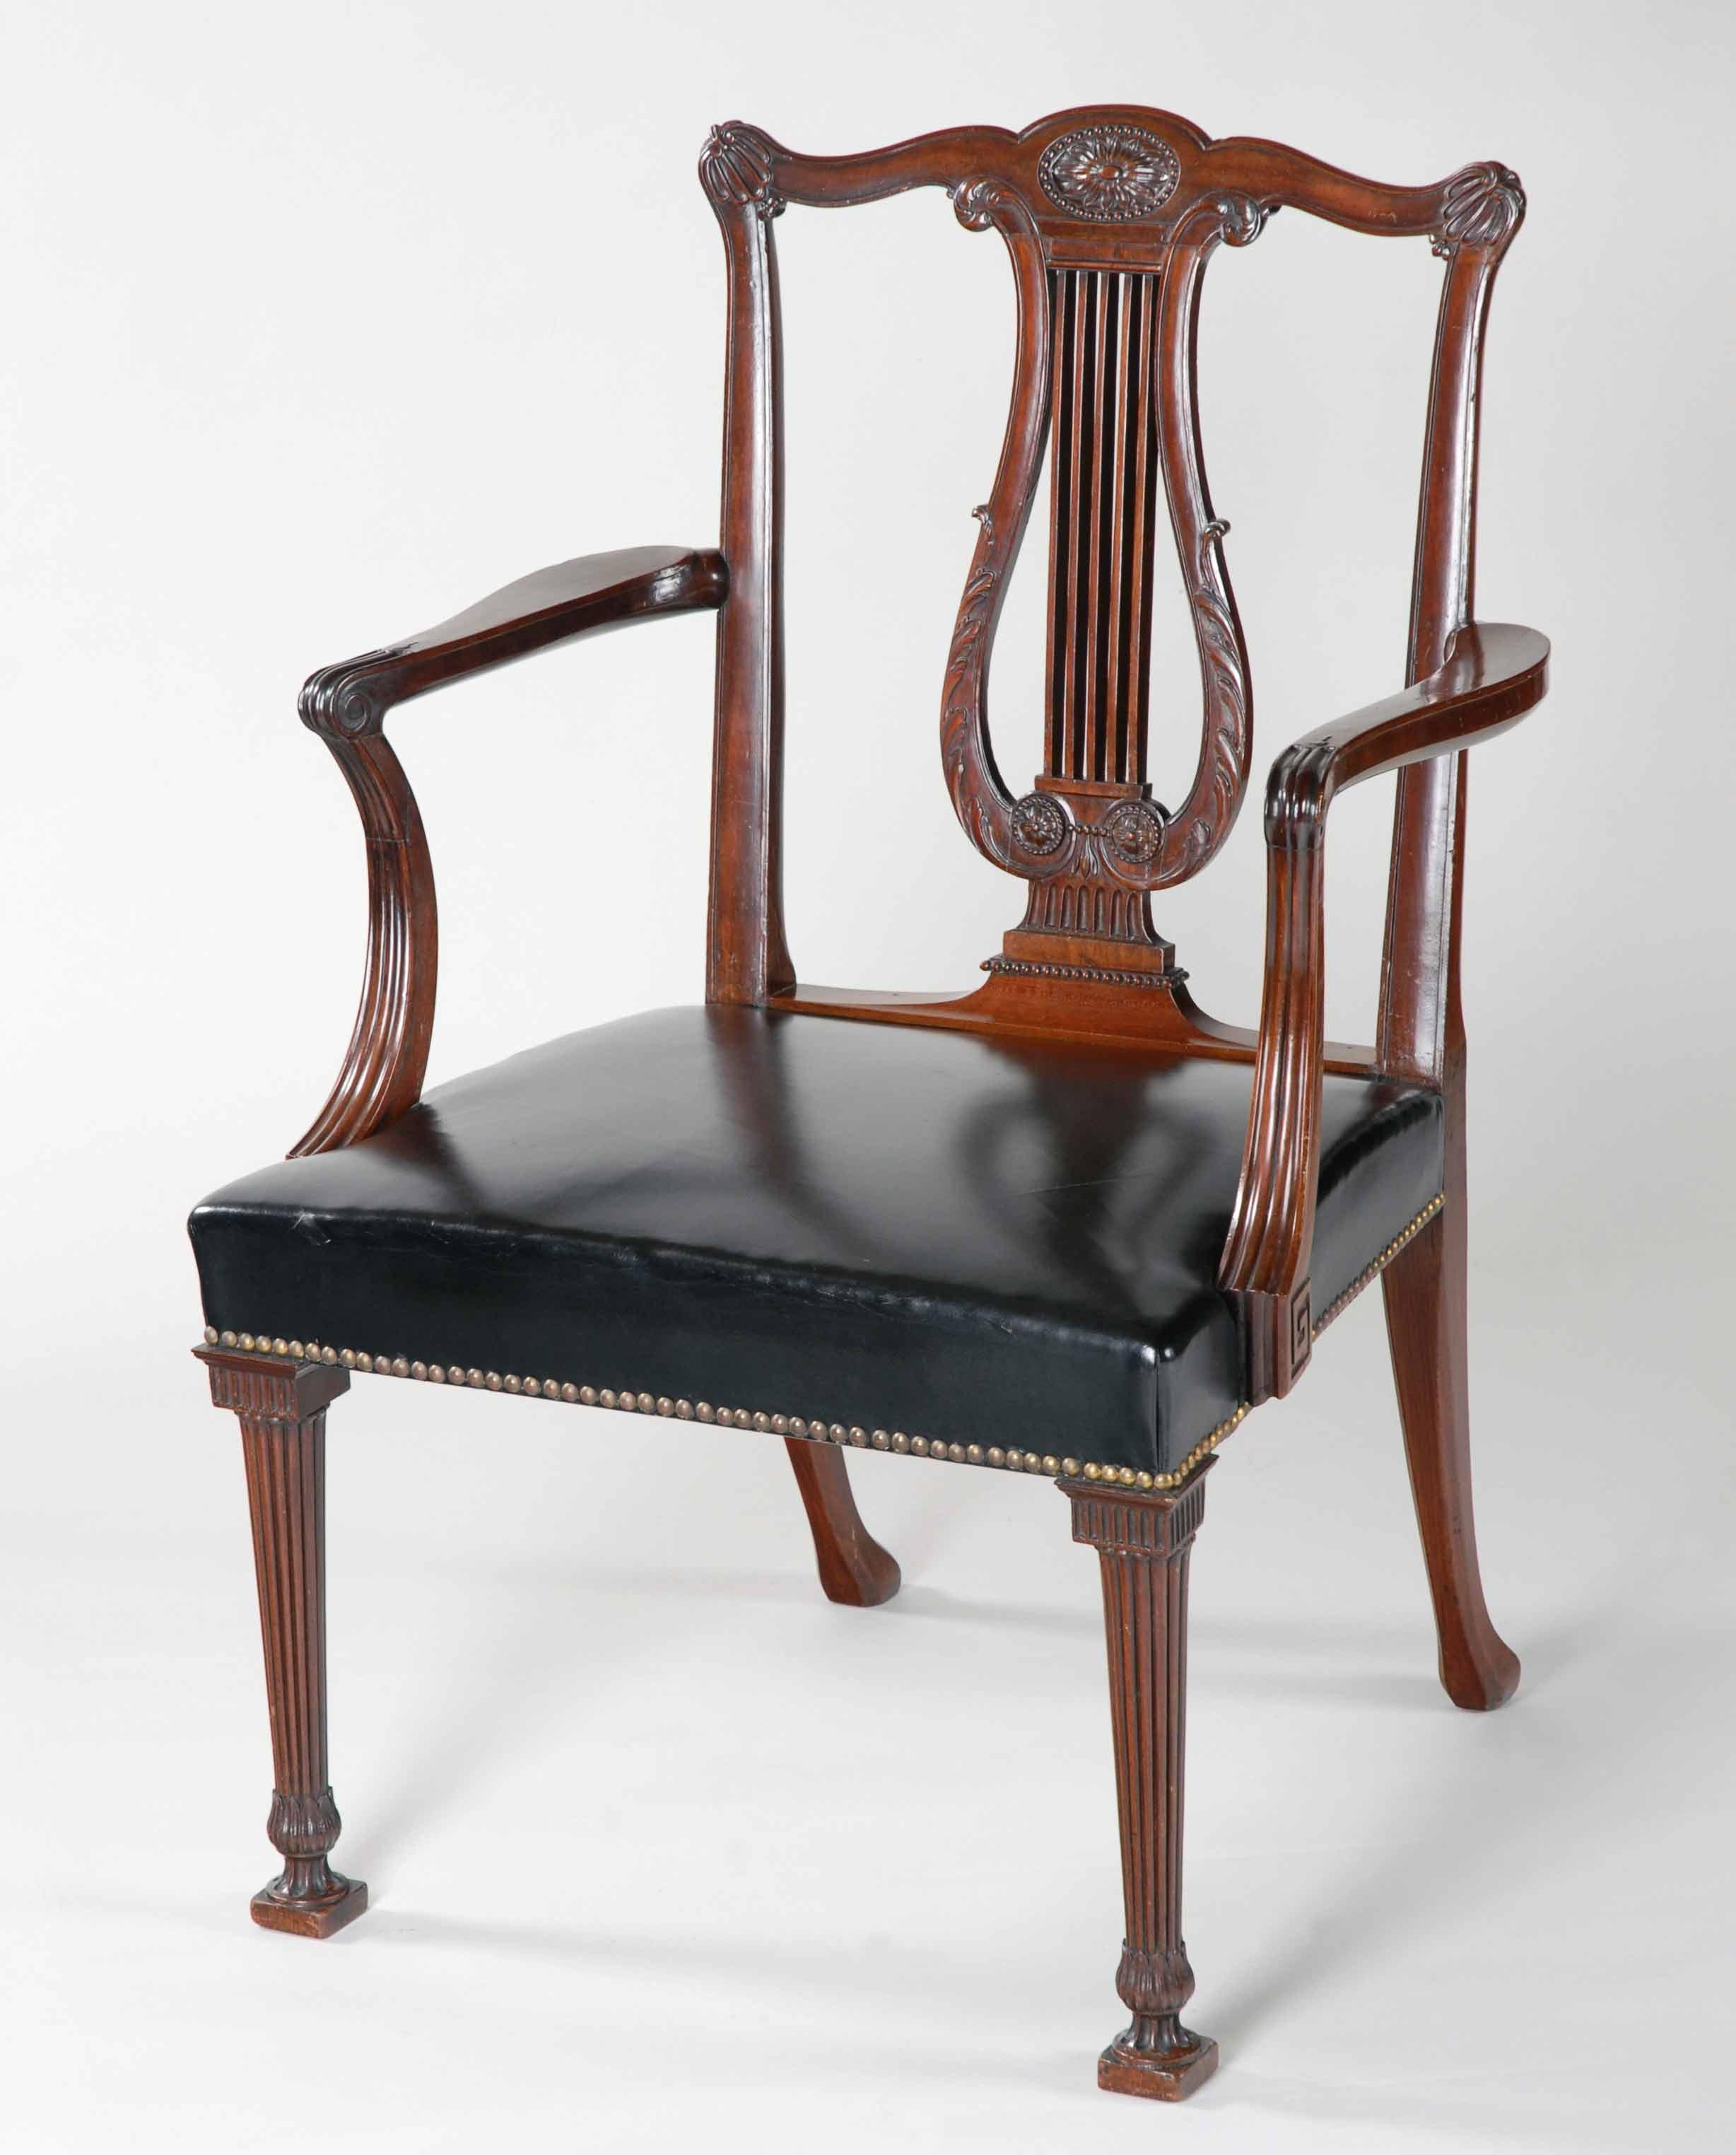 12. Library armchair ex Brocket